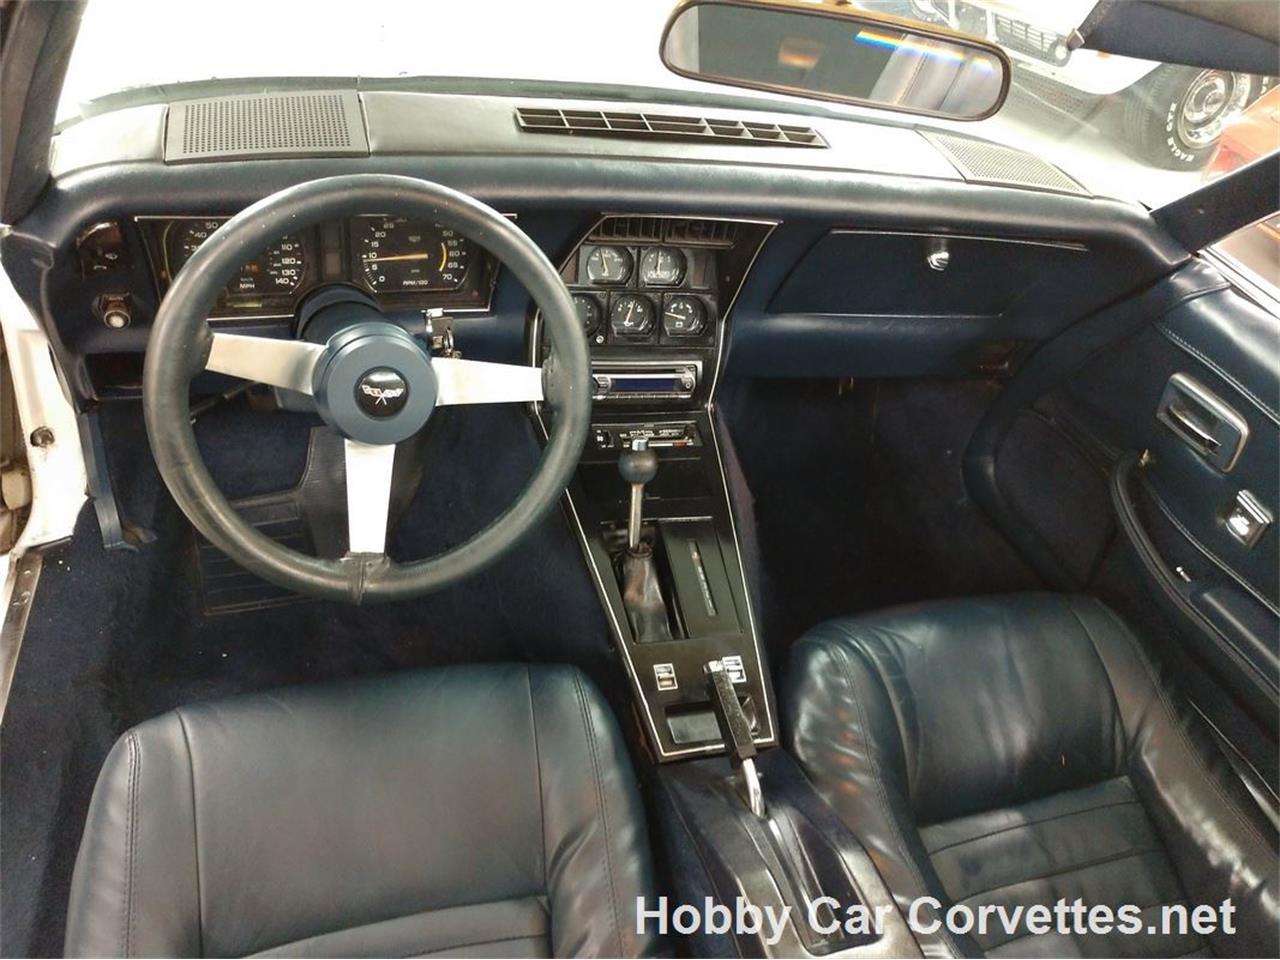 1979 Chevrolet Corvette (CC-1131362) for sale in Martinsburg, Pennsylvania